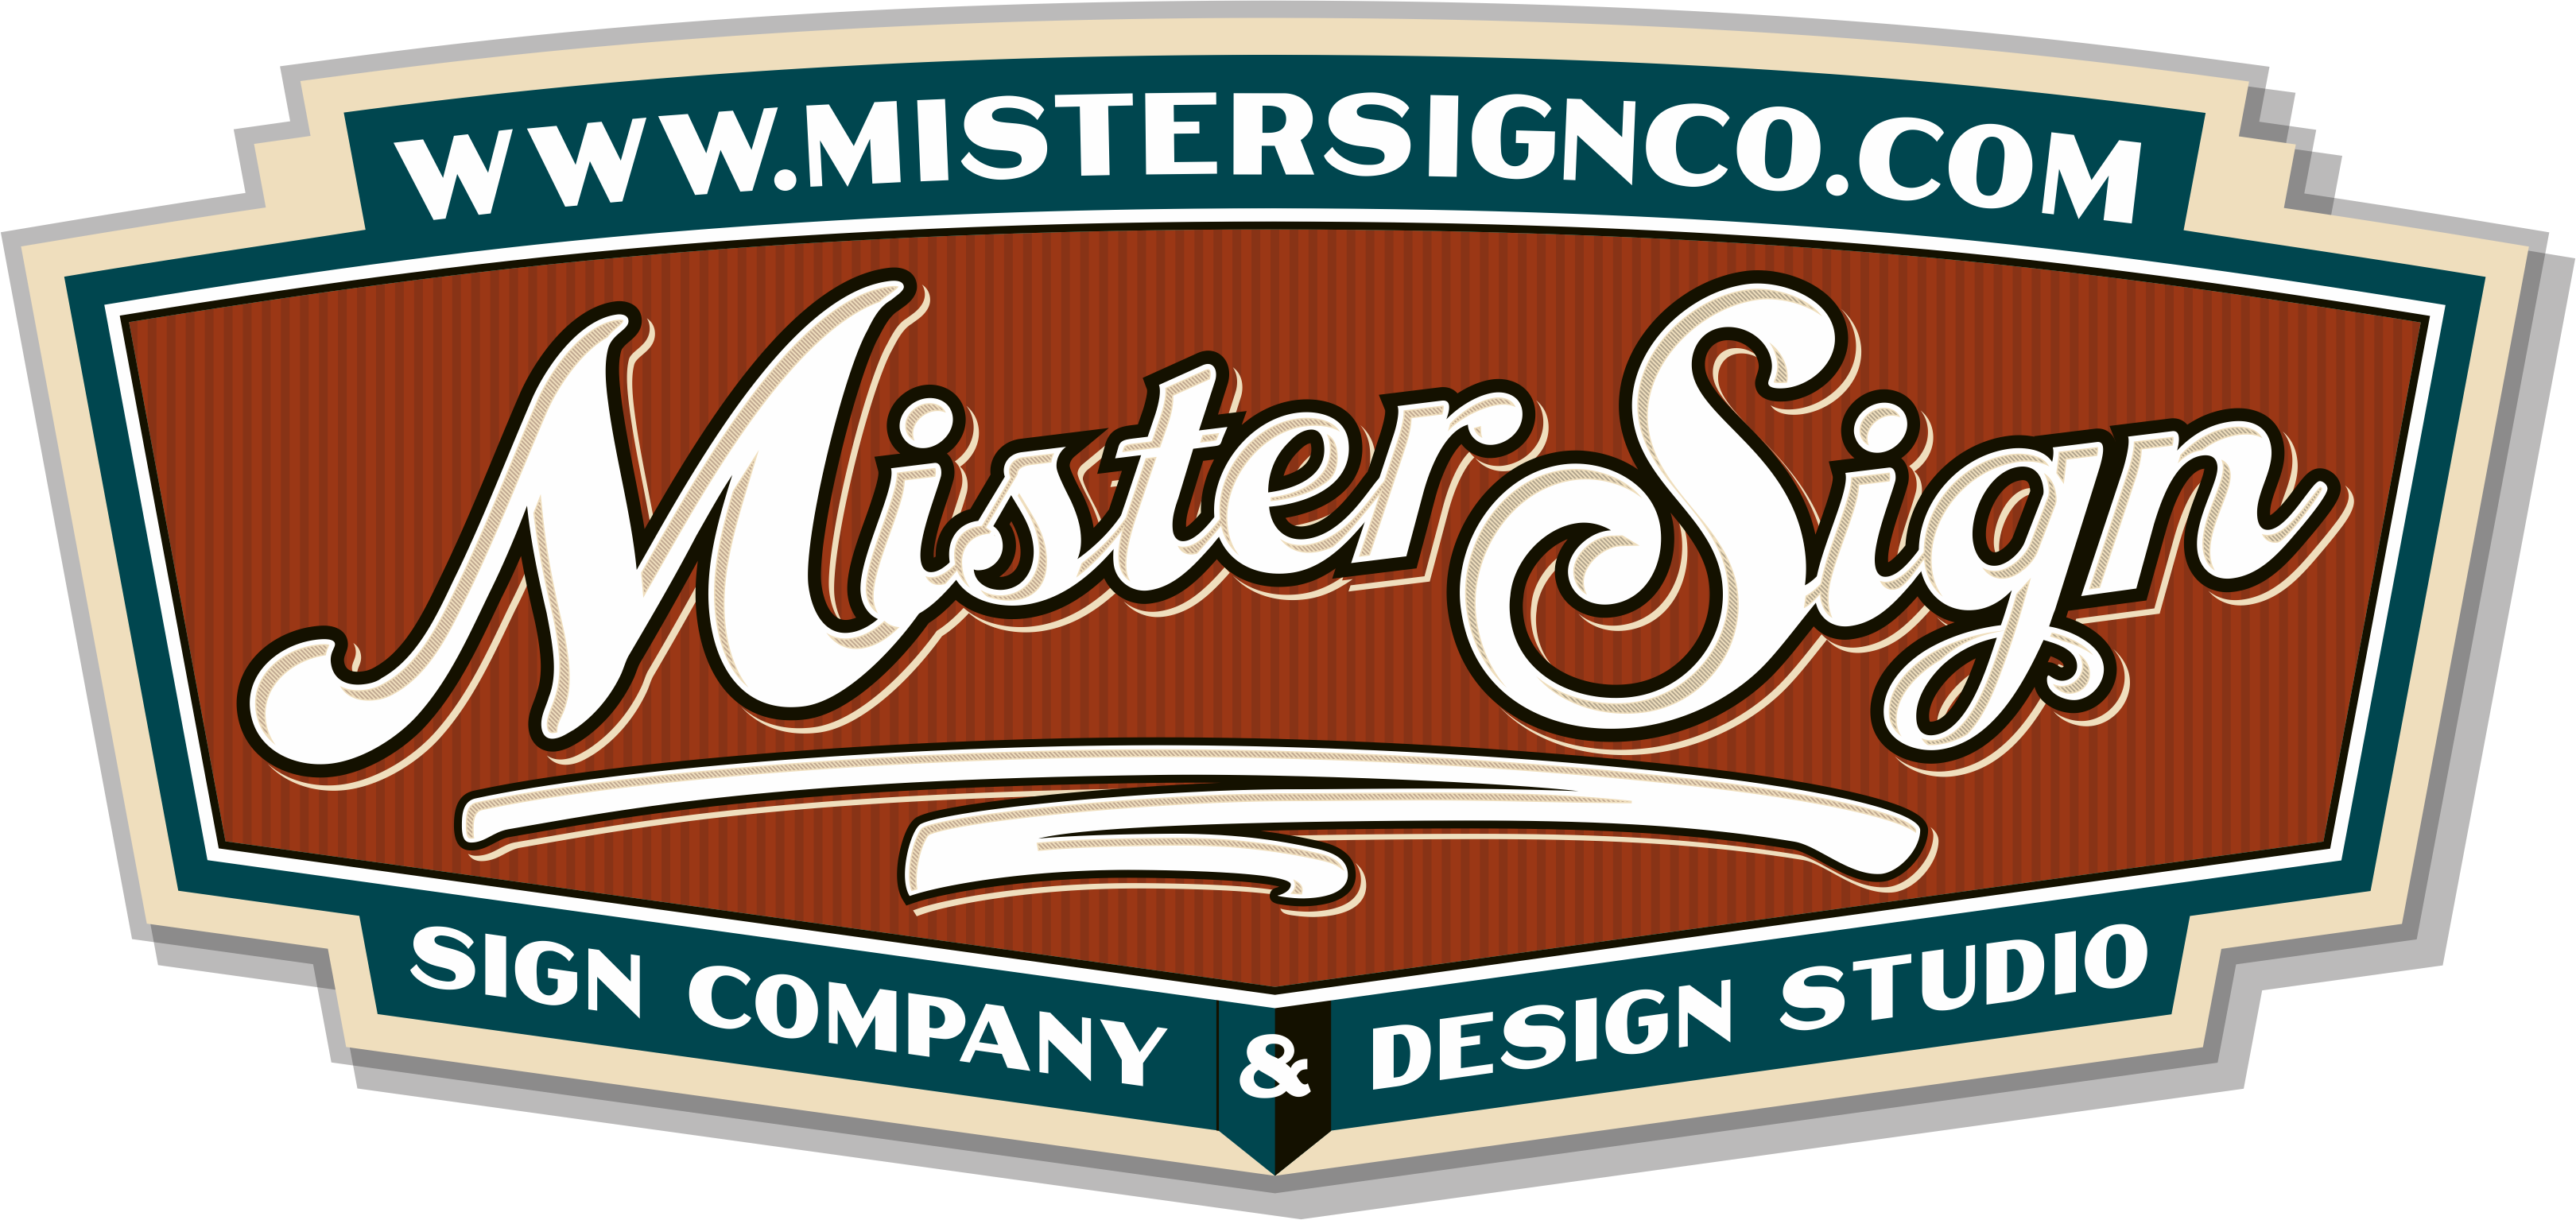 Mister Sign